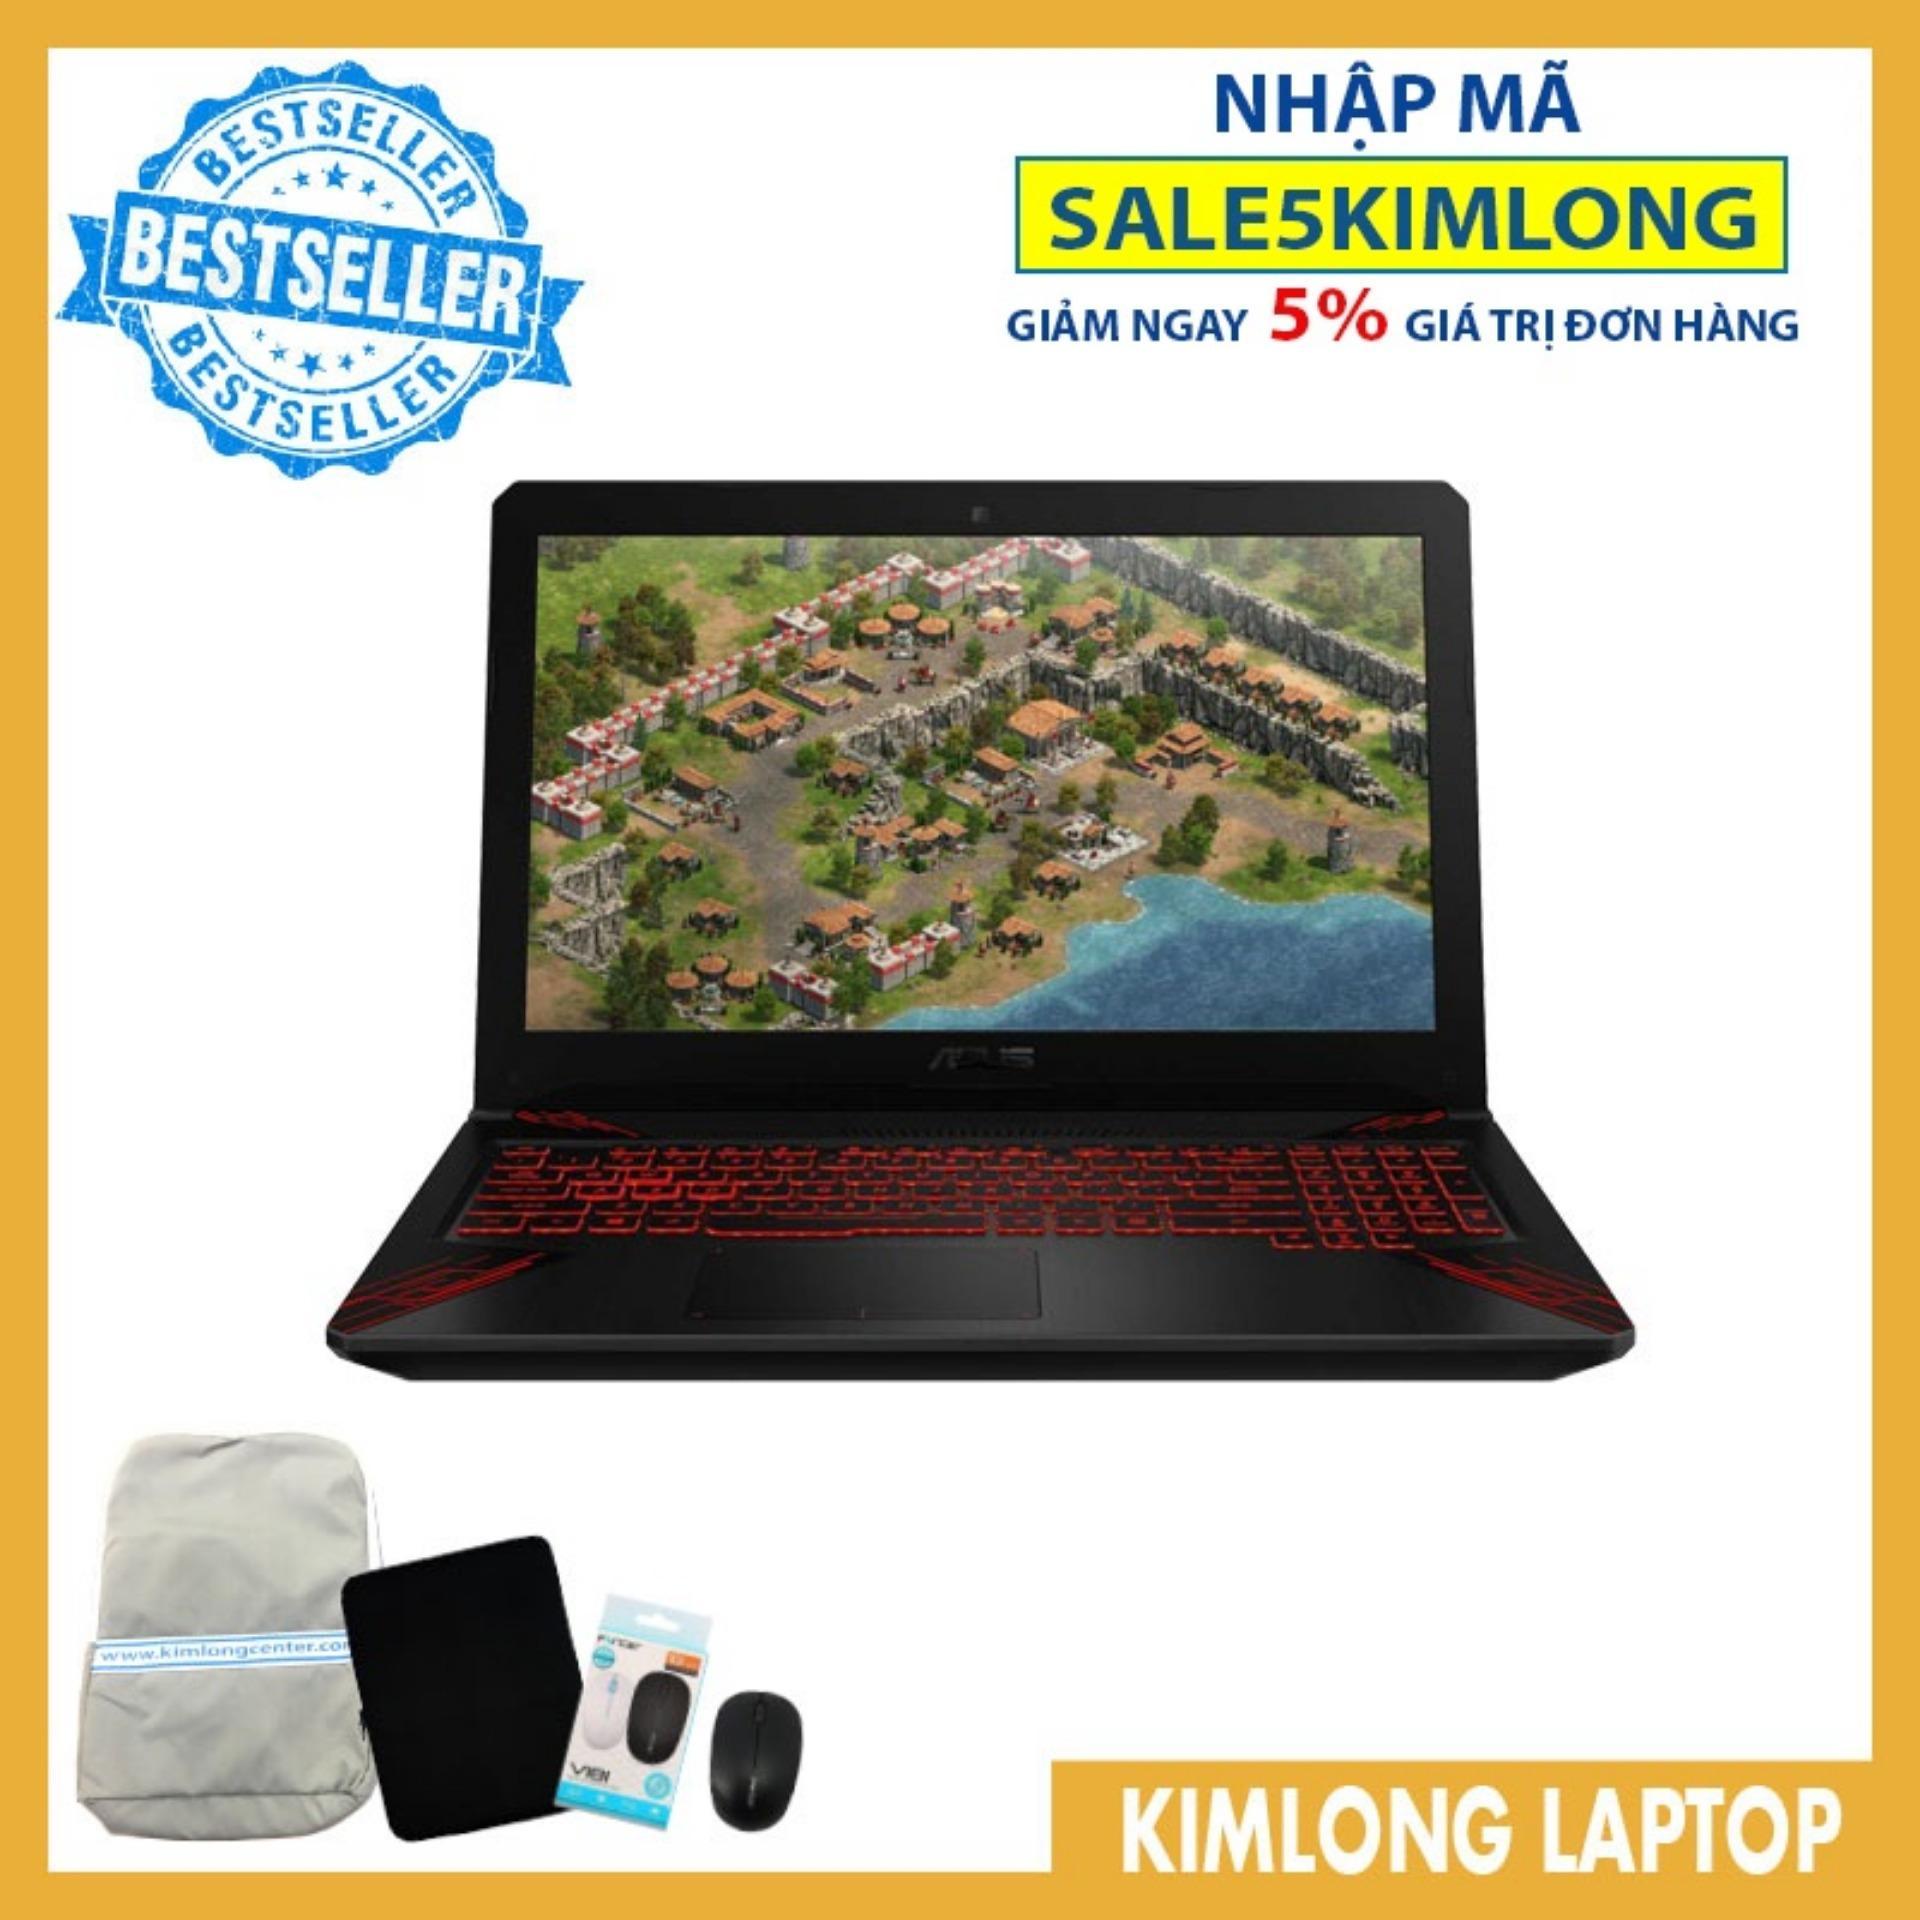 Bảng giá Laptop Asus TUF Gaming FX504GE-E4059T i7-8750H 8GB DDR4 1TB